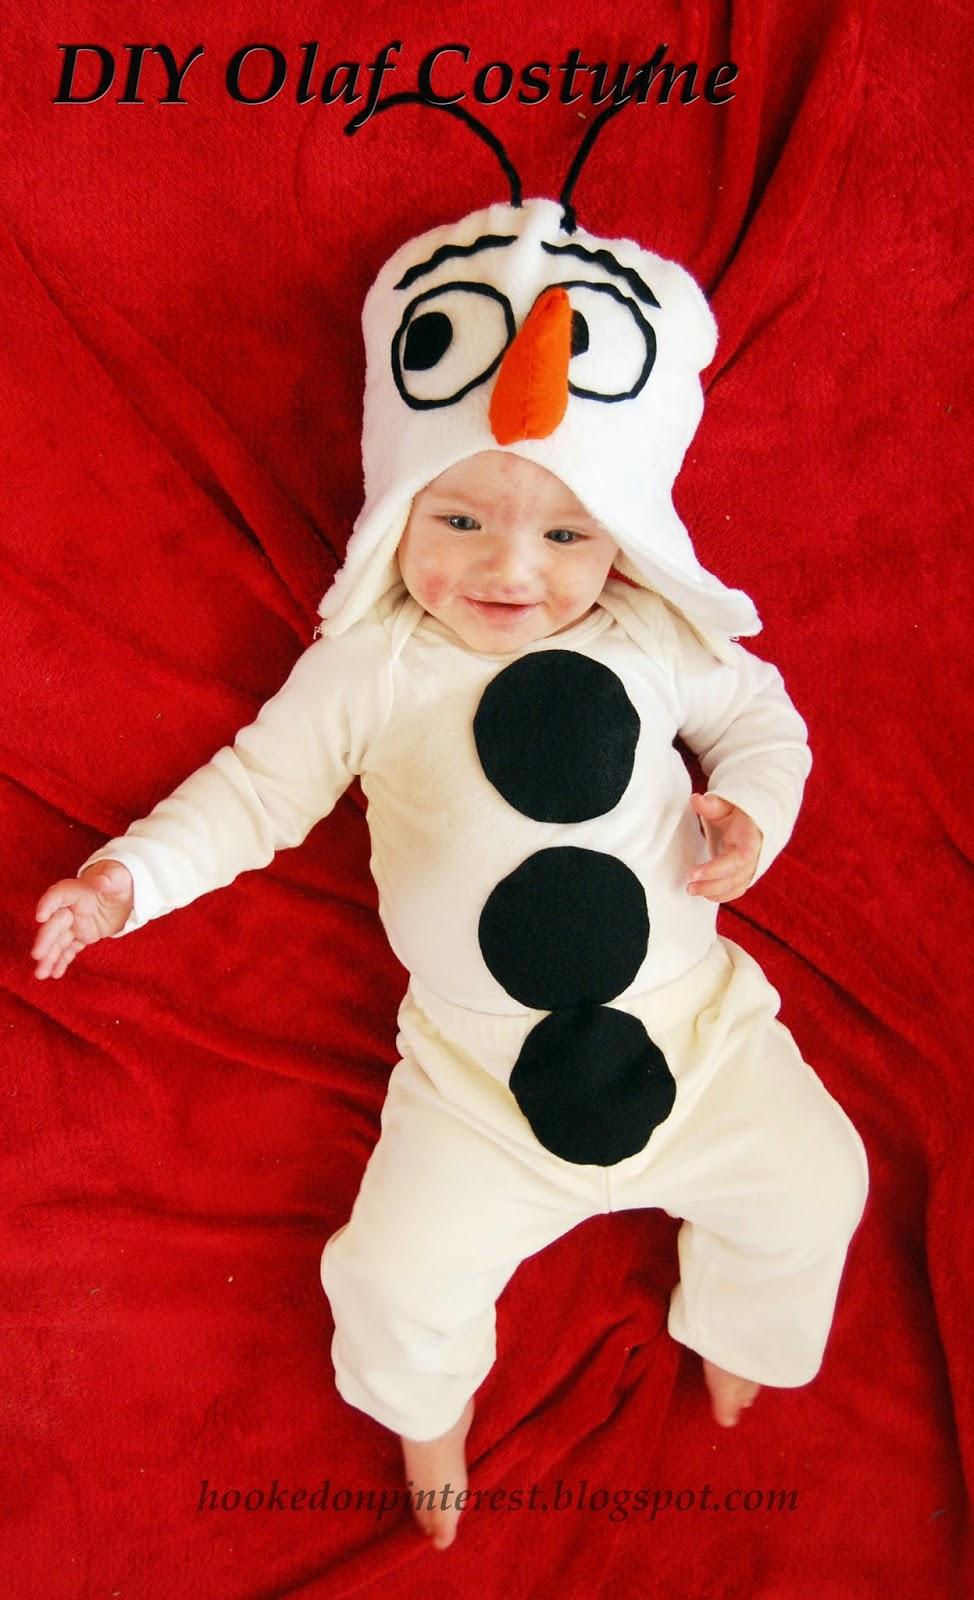 Hooked Diy Olaf Costume